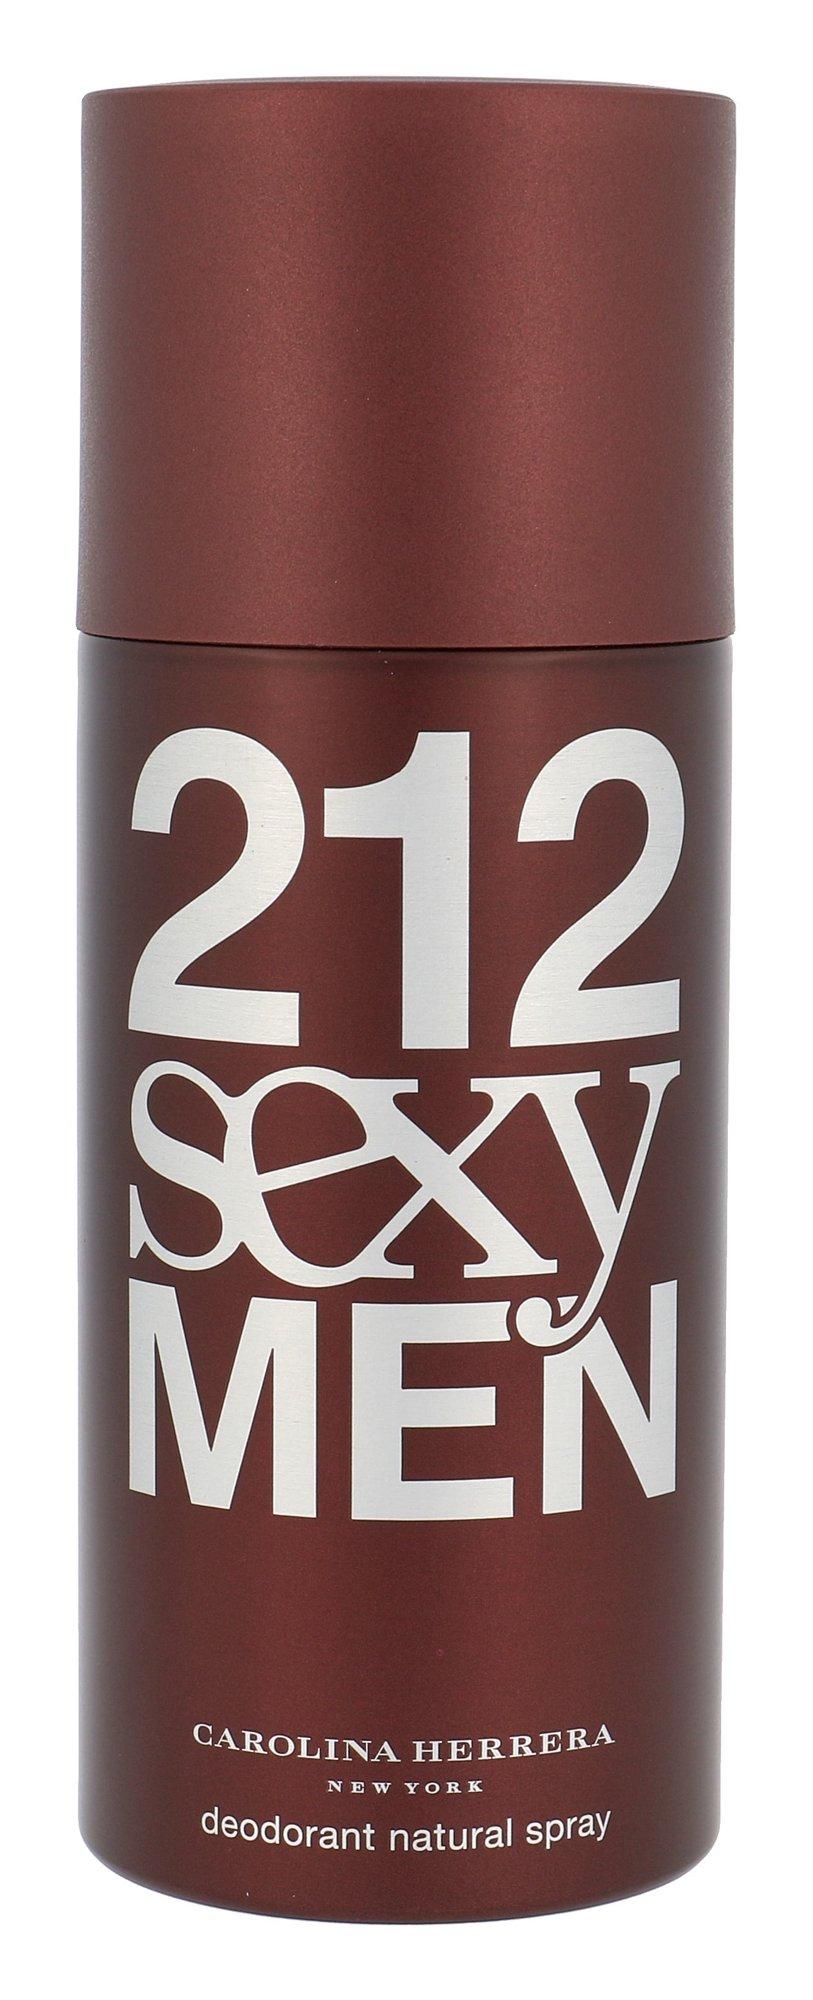 Carolina Herrera 212 Sexy Men Deodorant 150ml